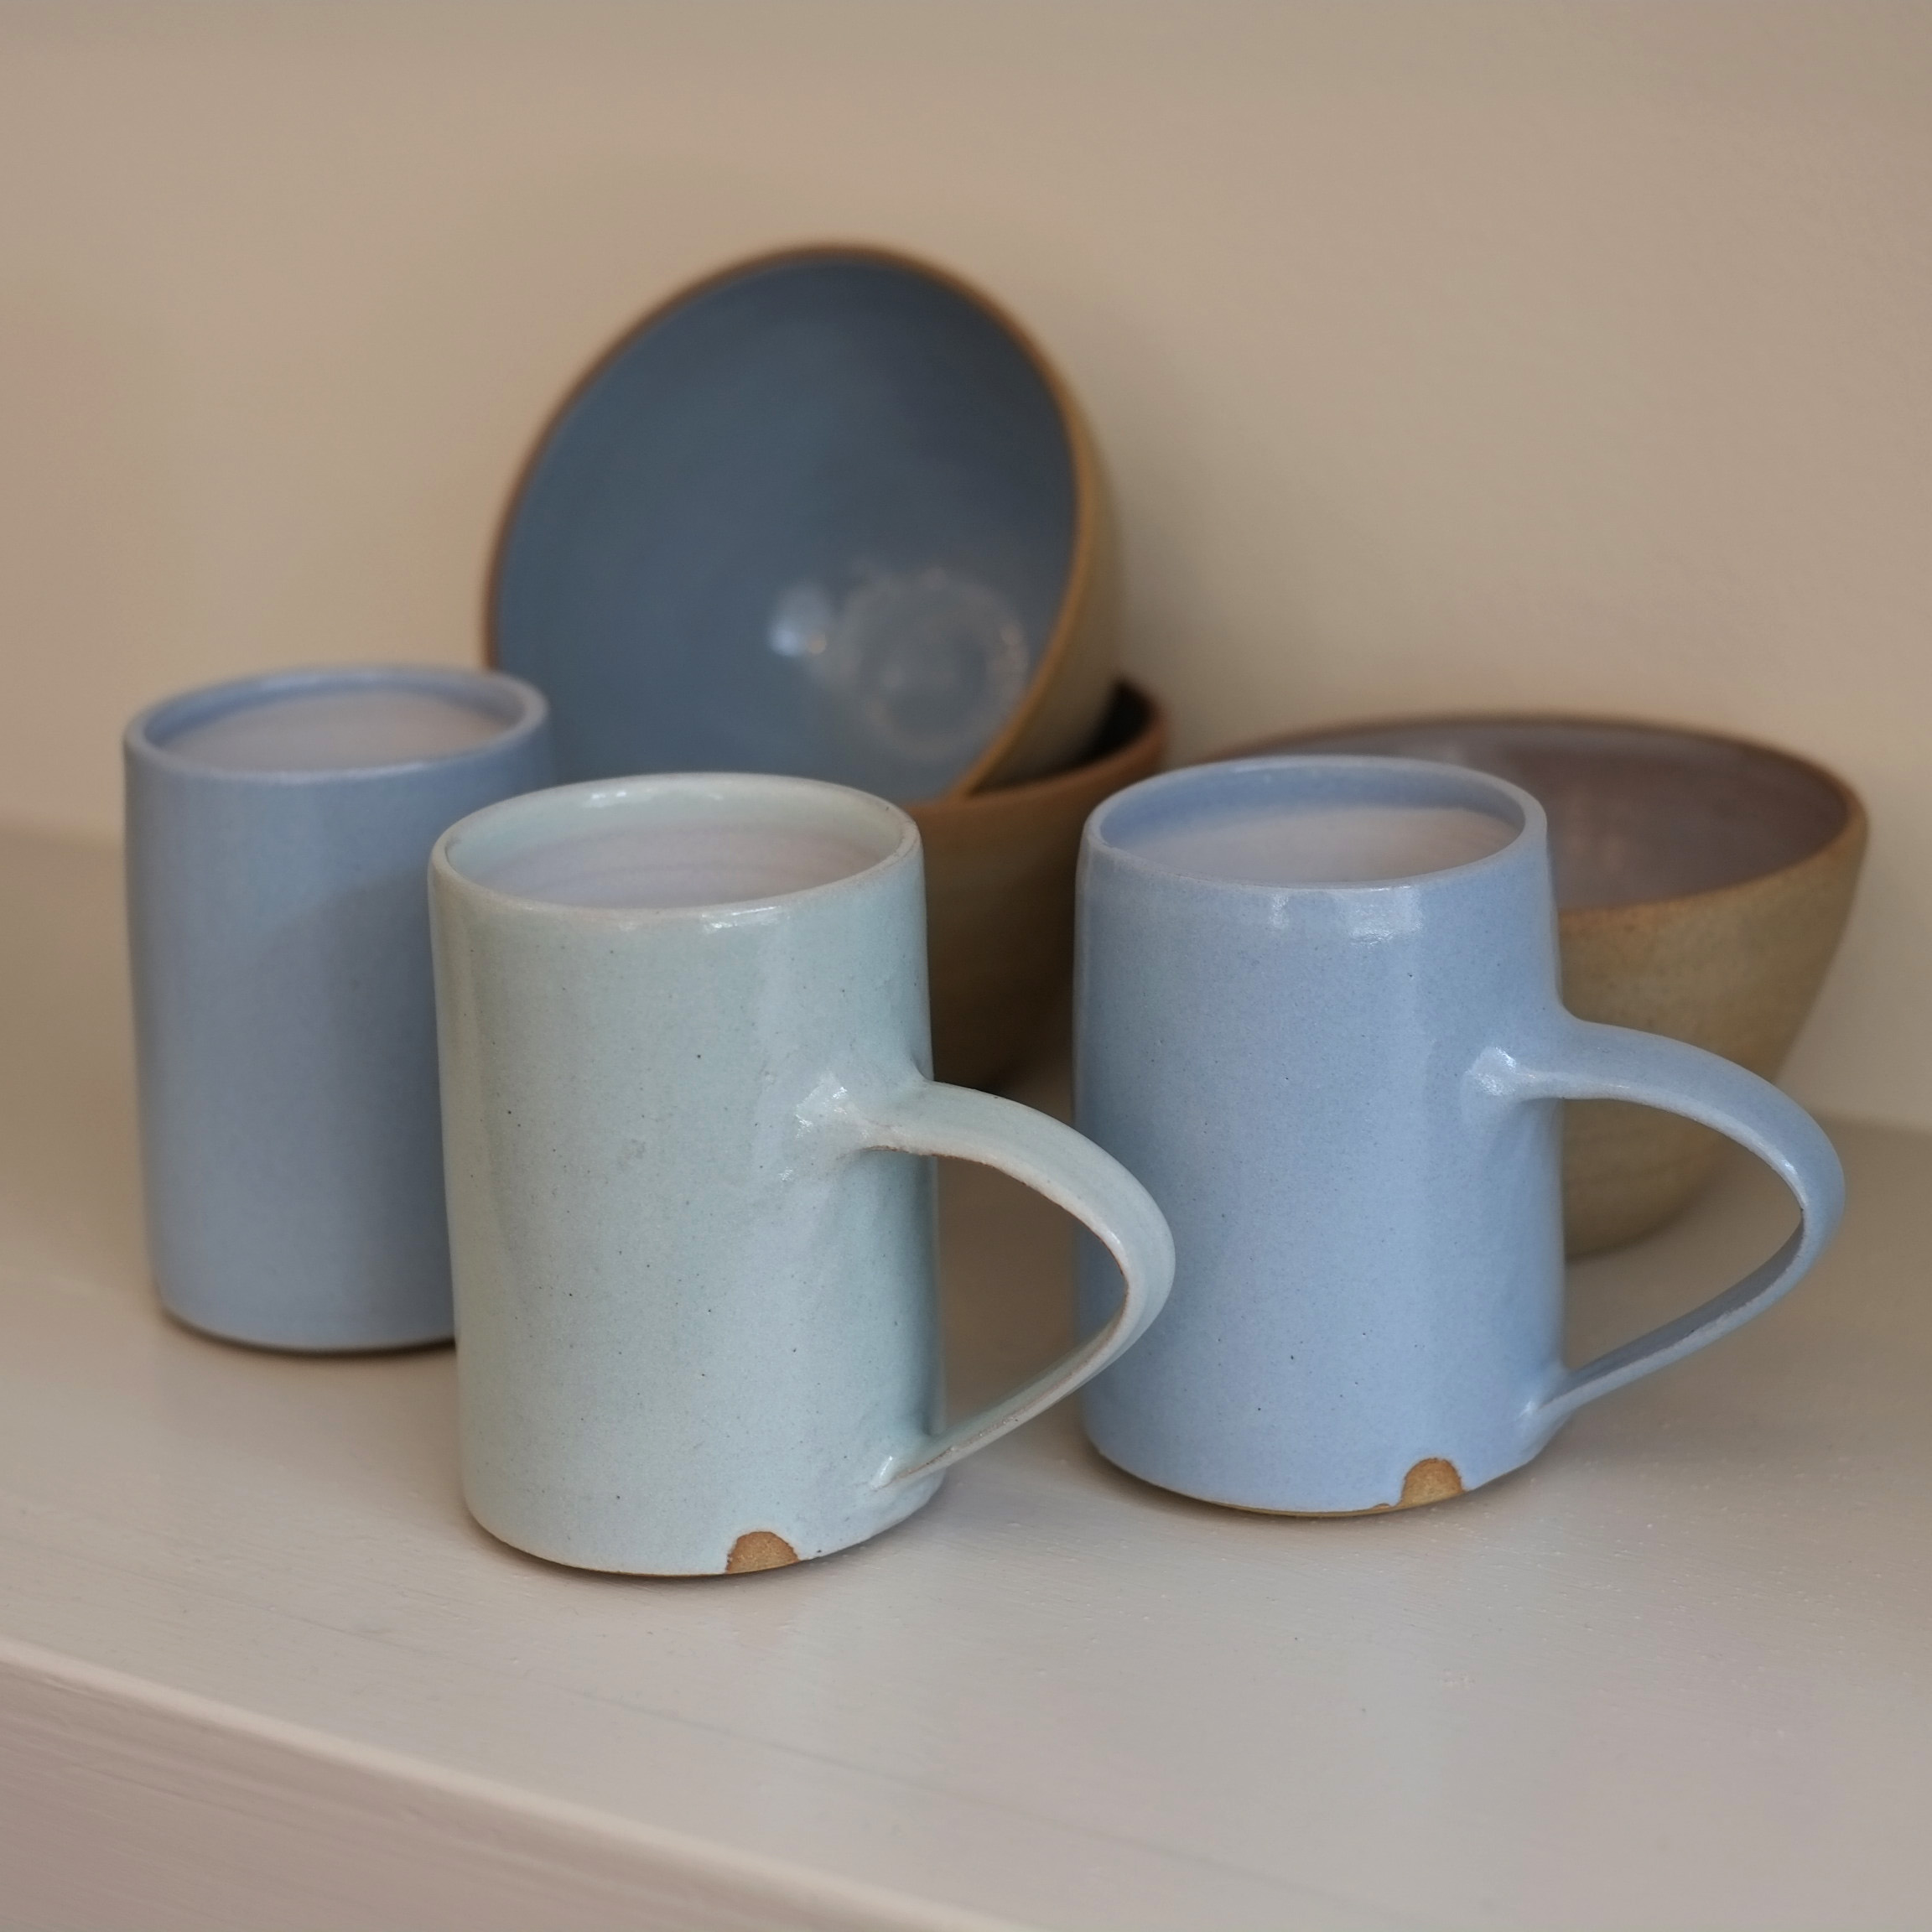 Kneebone Ceramics